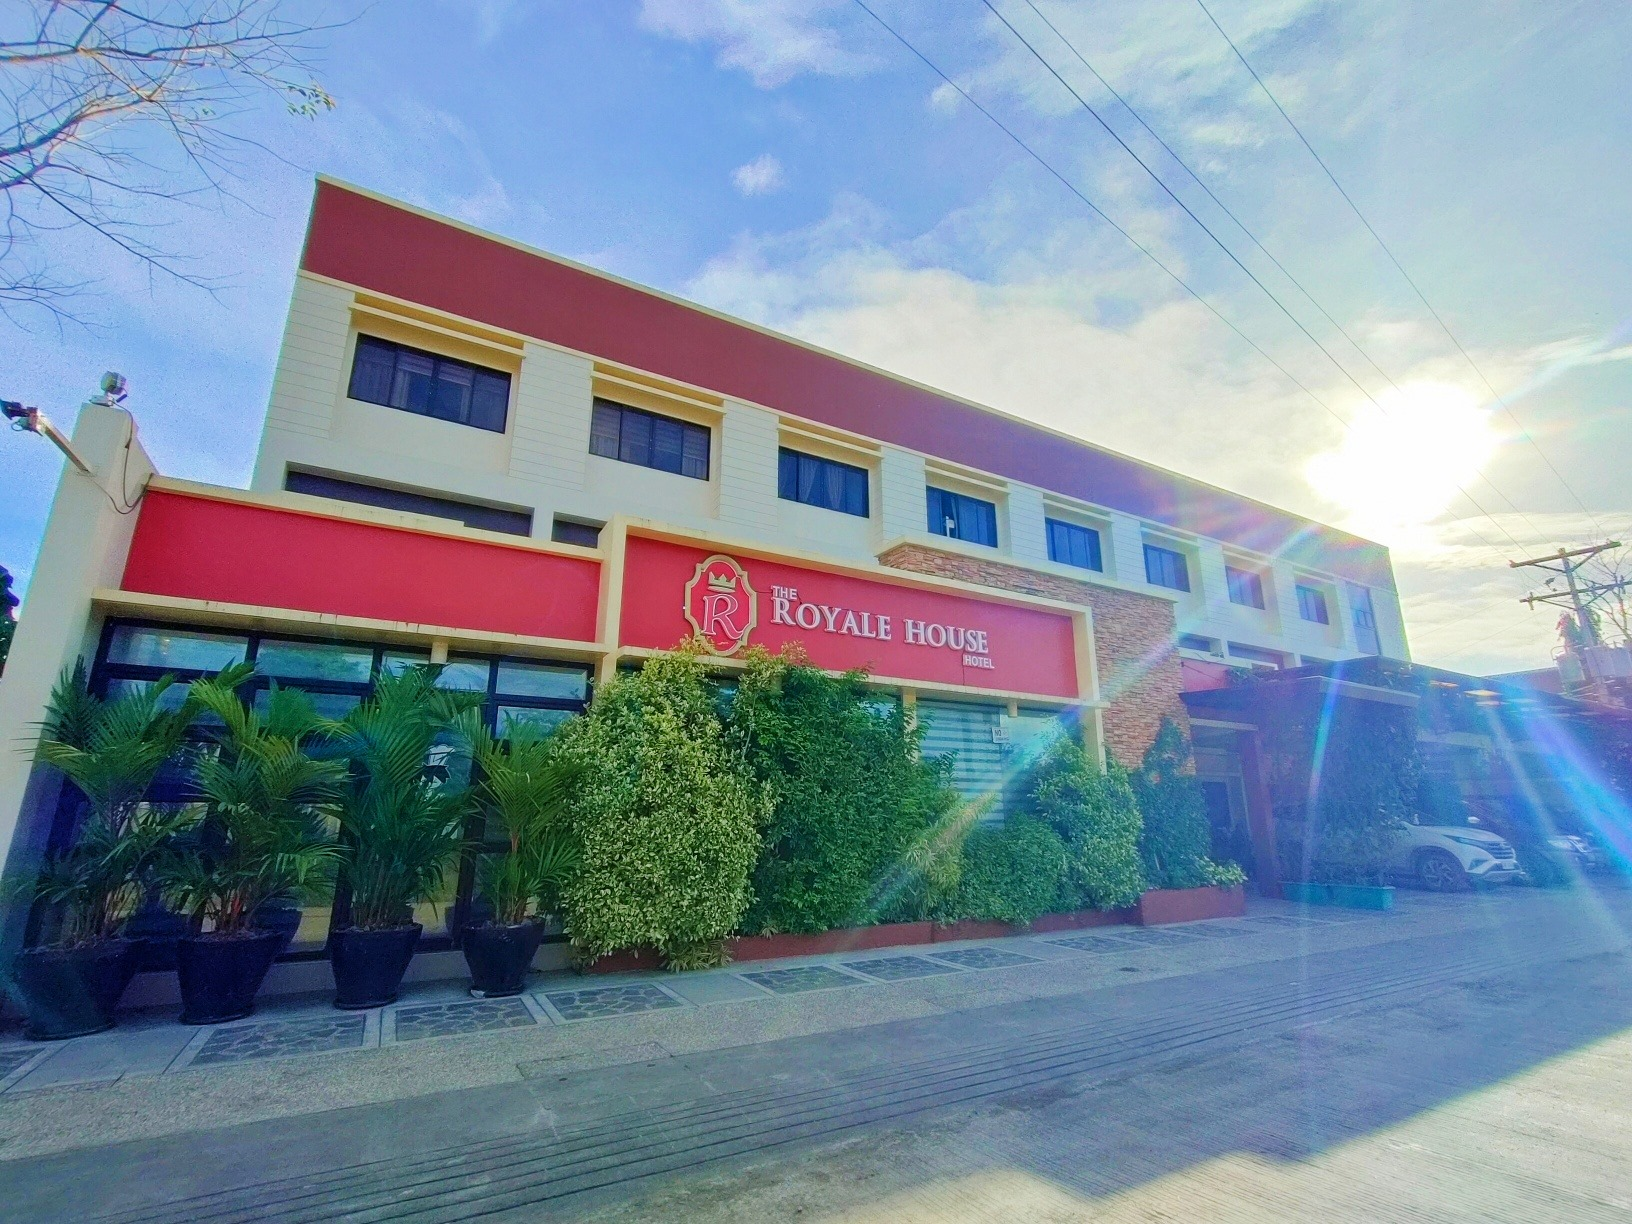 The Royale House Travel Inn and Dormitel 3